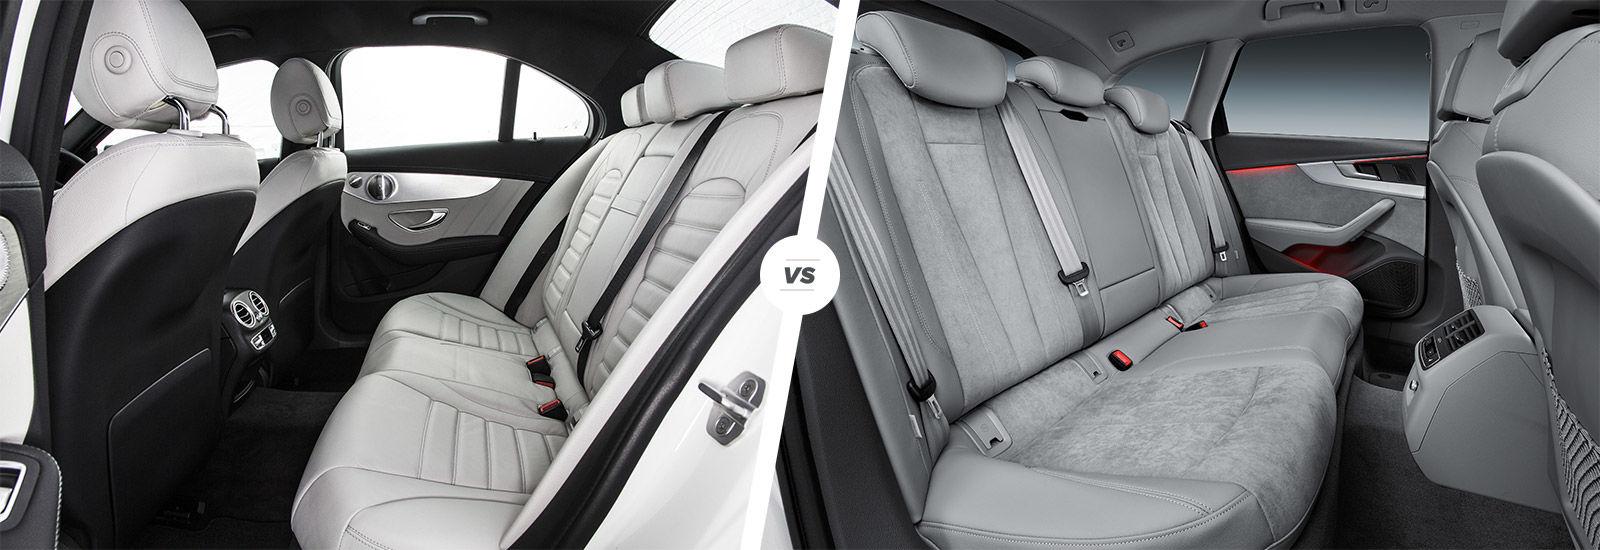 Mercedes C Class Vs Audi A4 Comparison Carwow